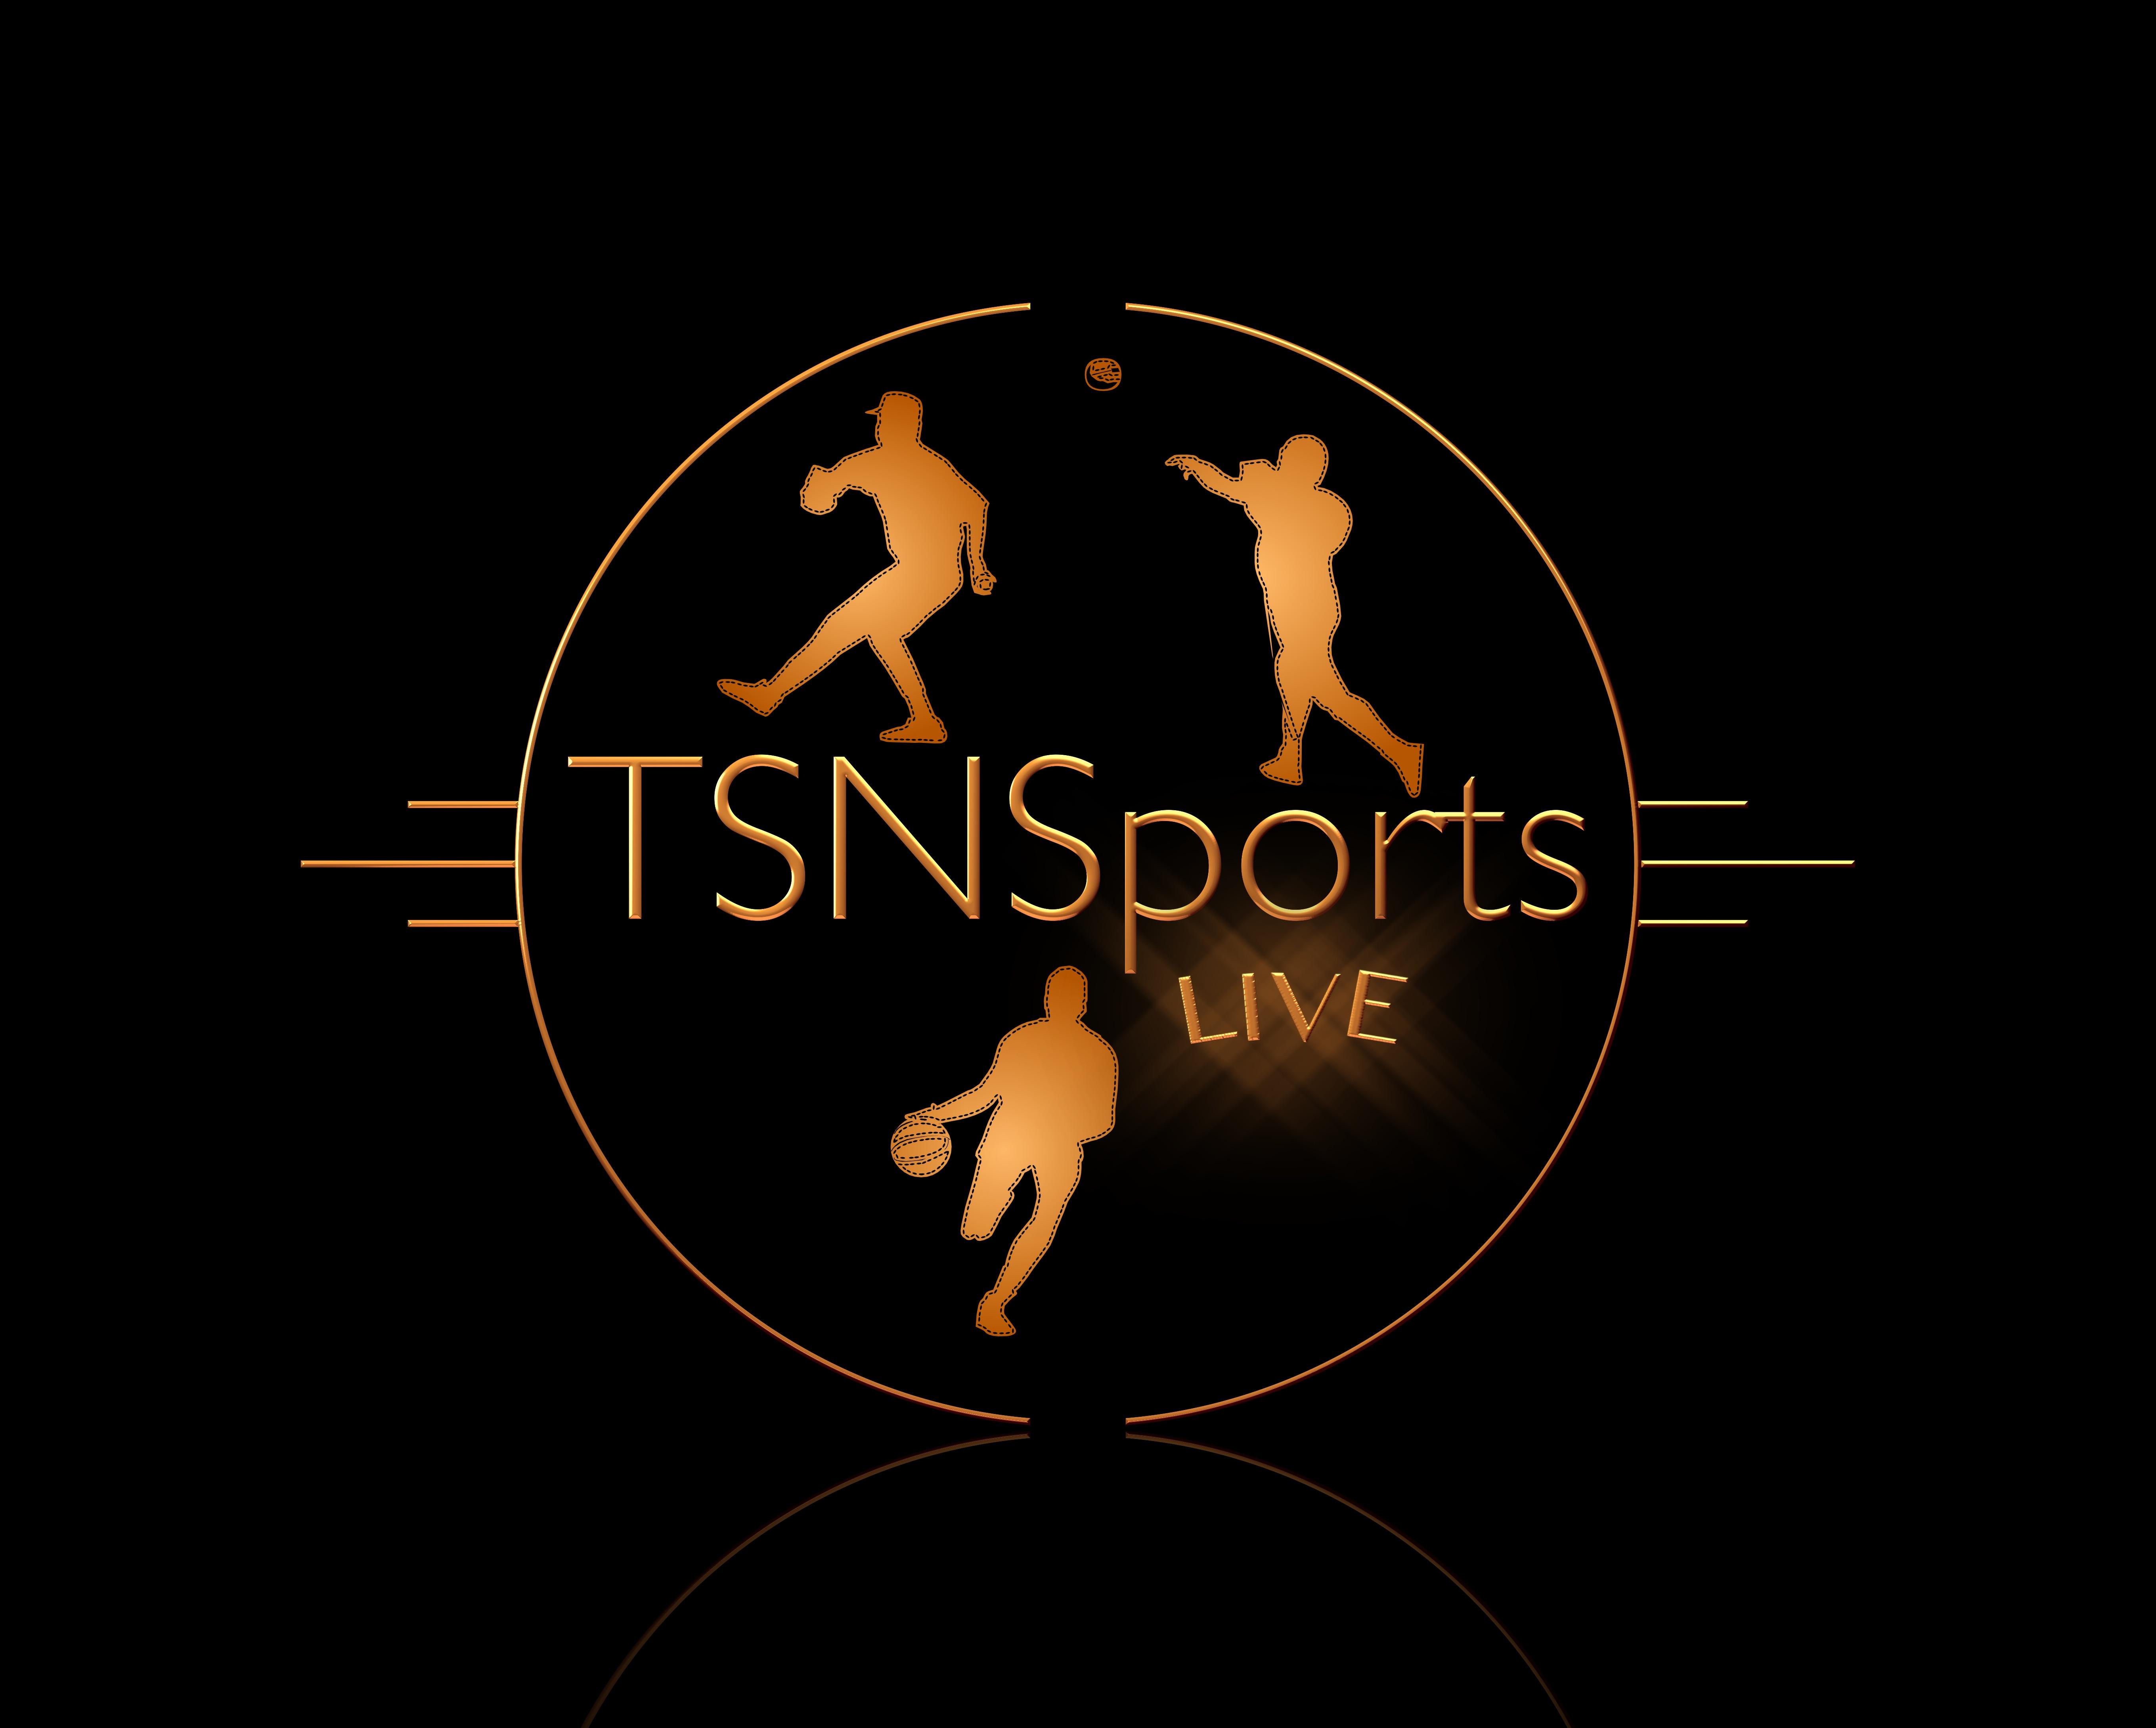 TSNSports-Live-Web-Banner-Header.jpg